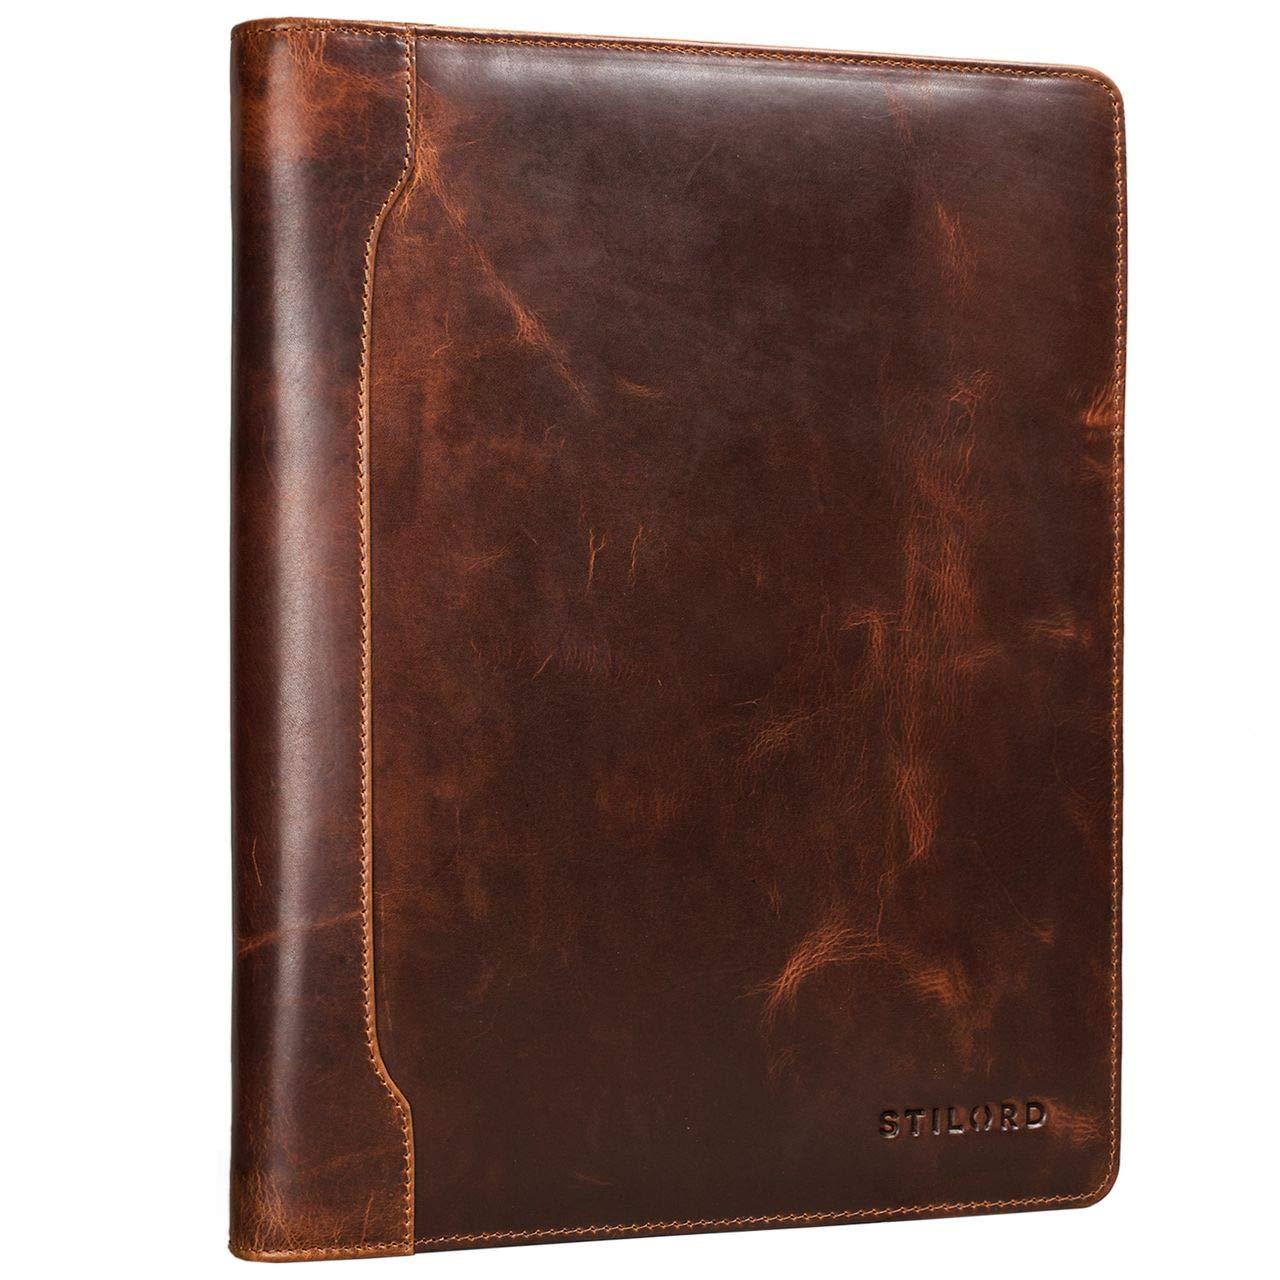 STILORD 'Arvid' Leder Konferenzmappe Vintage Dokumentenmappe A4 mit Ringmechanik 13,3 Zoll Schreibmappe Aktenmappe Ringbuch, Farbe:Kara - Cognac